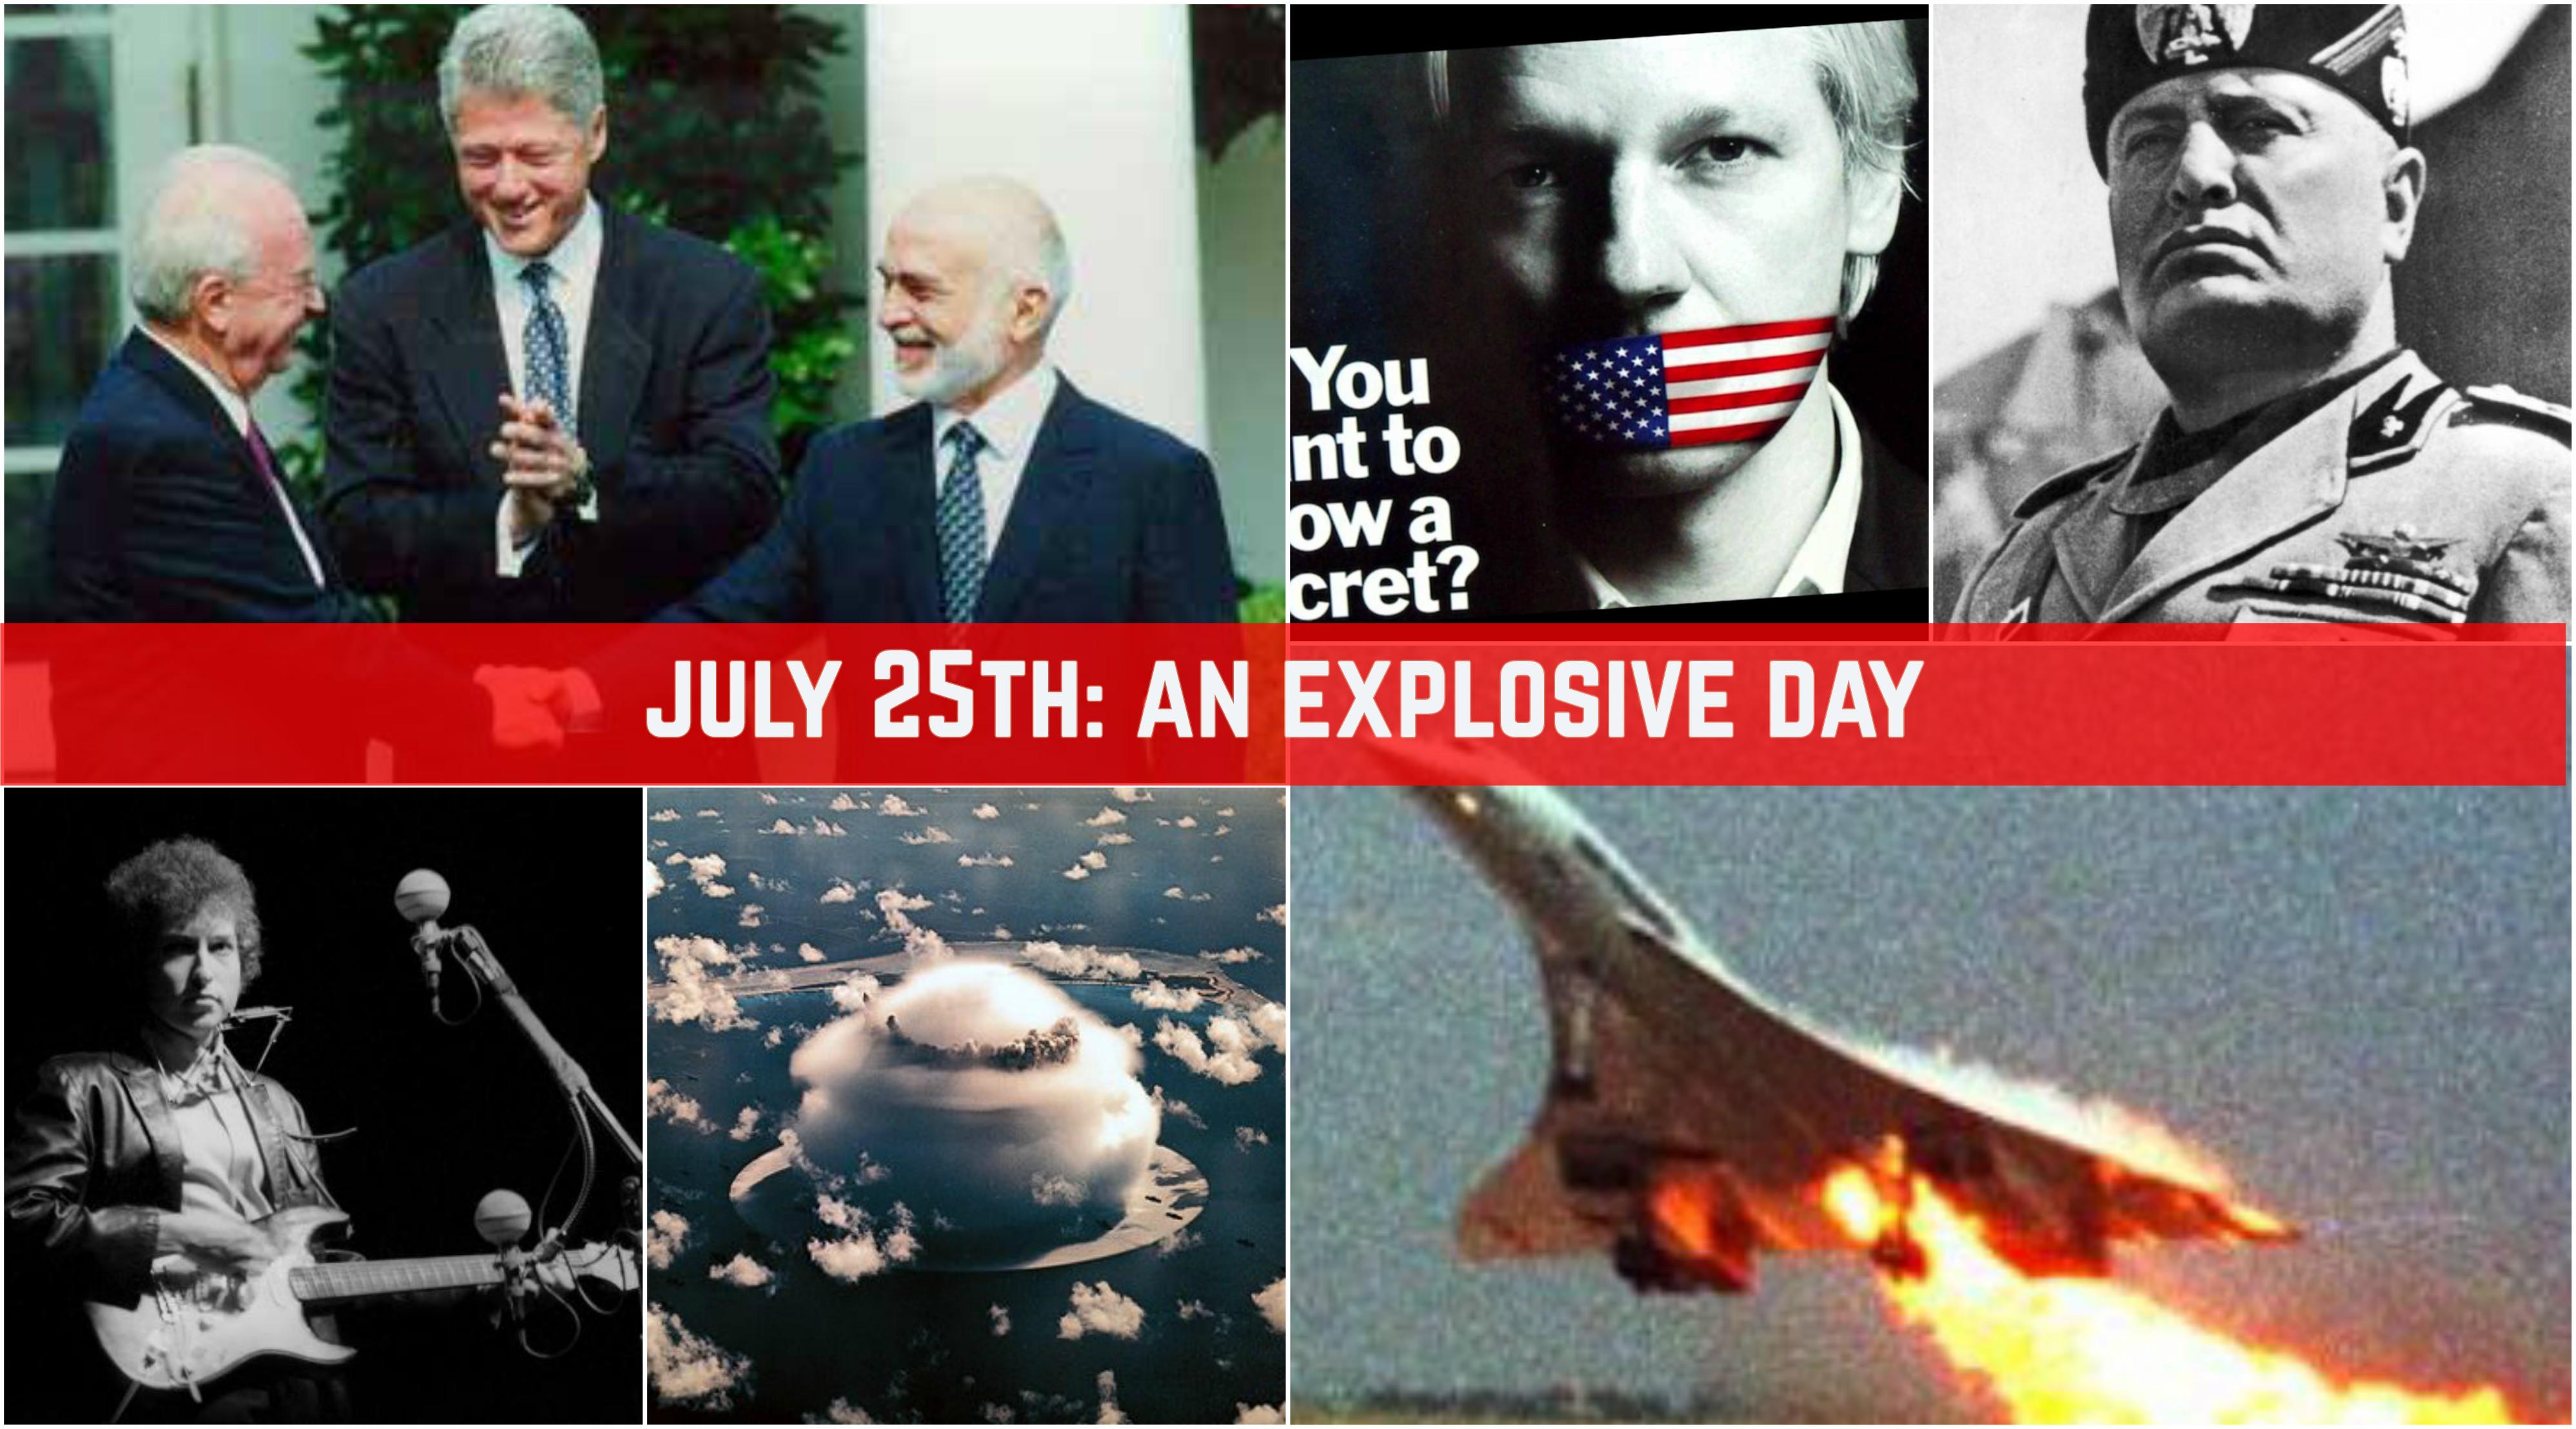 Jul-25: An Explosive Day